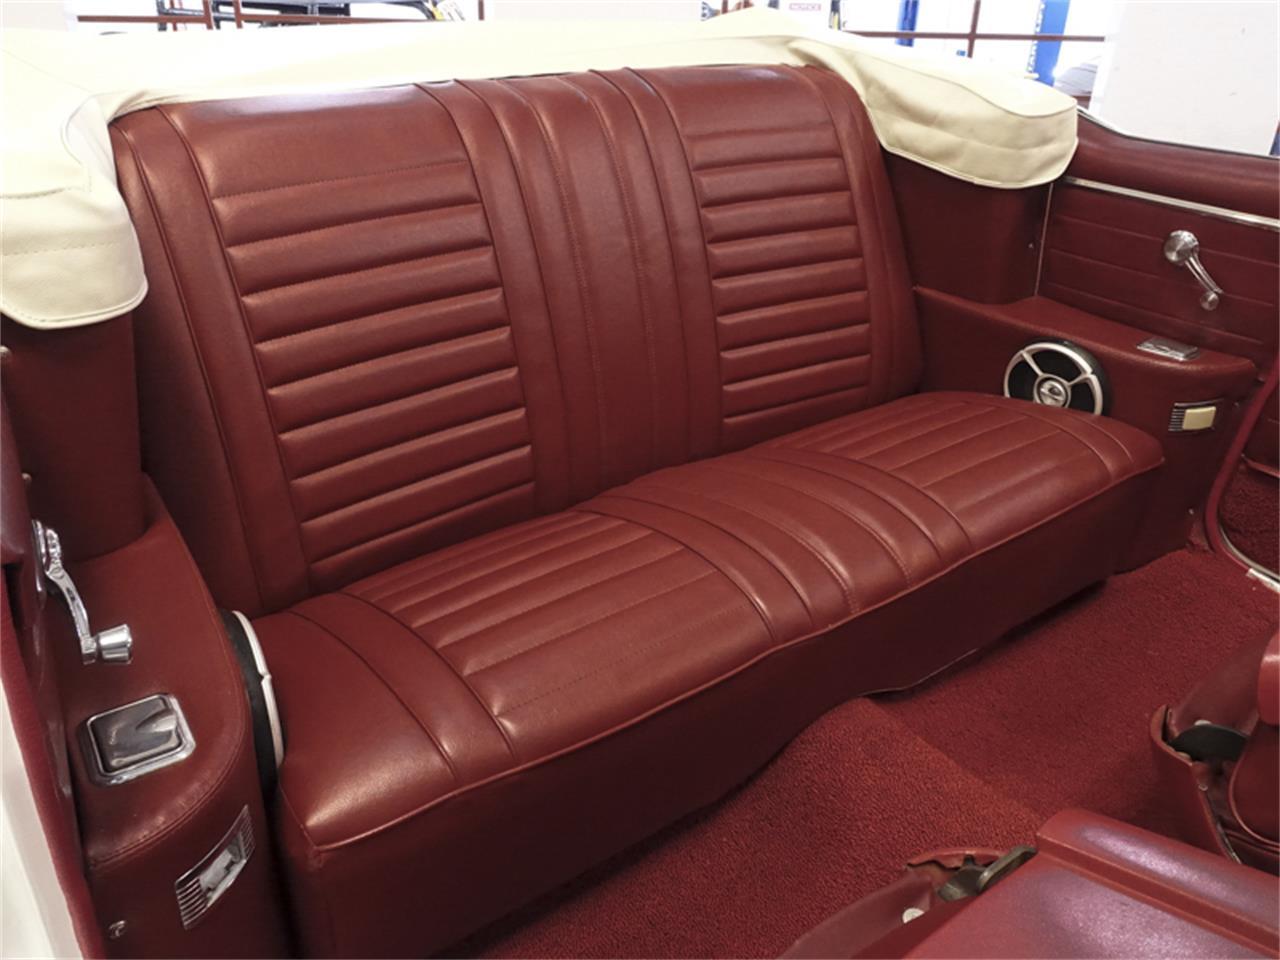 Large Picture of Classic '67 Oldsmobile Cutlass Supreme - $29,900.00 - QK0F